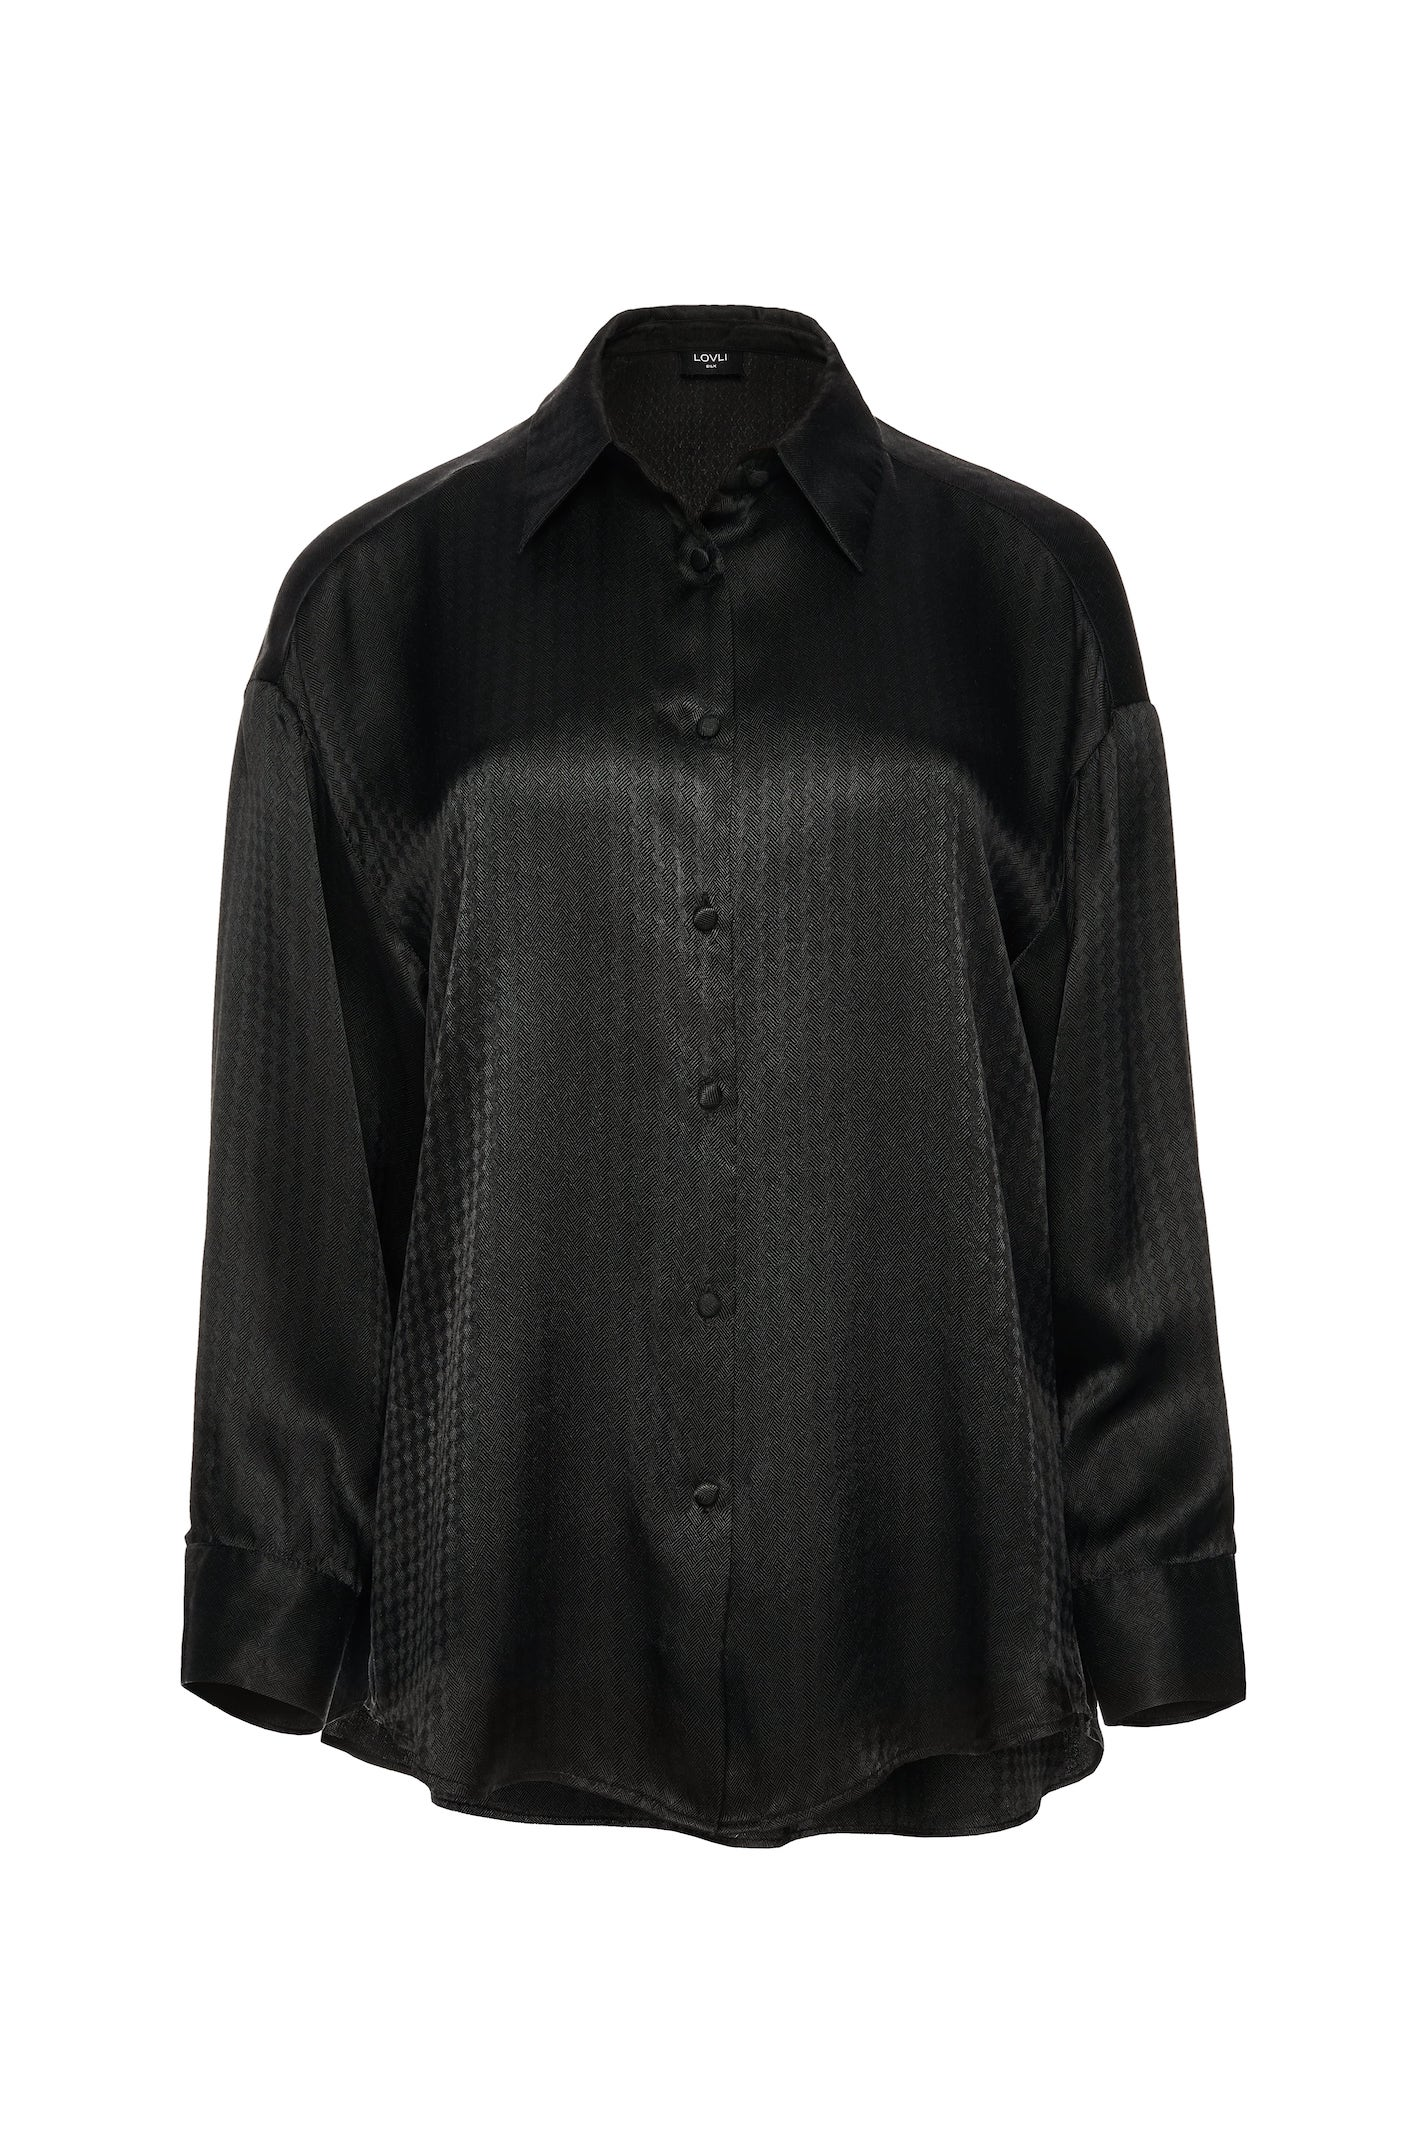 Oversize Silk Shirt in black